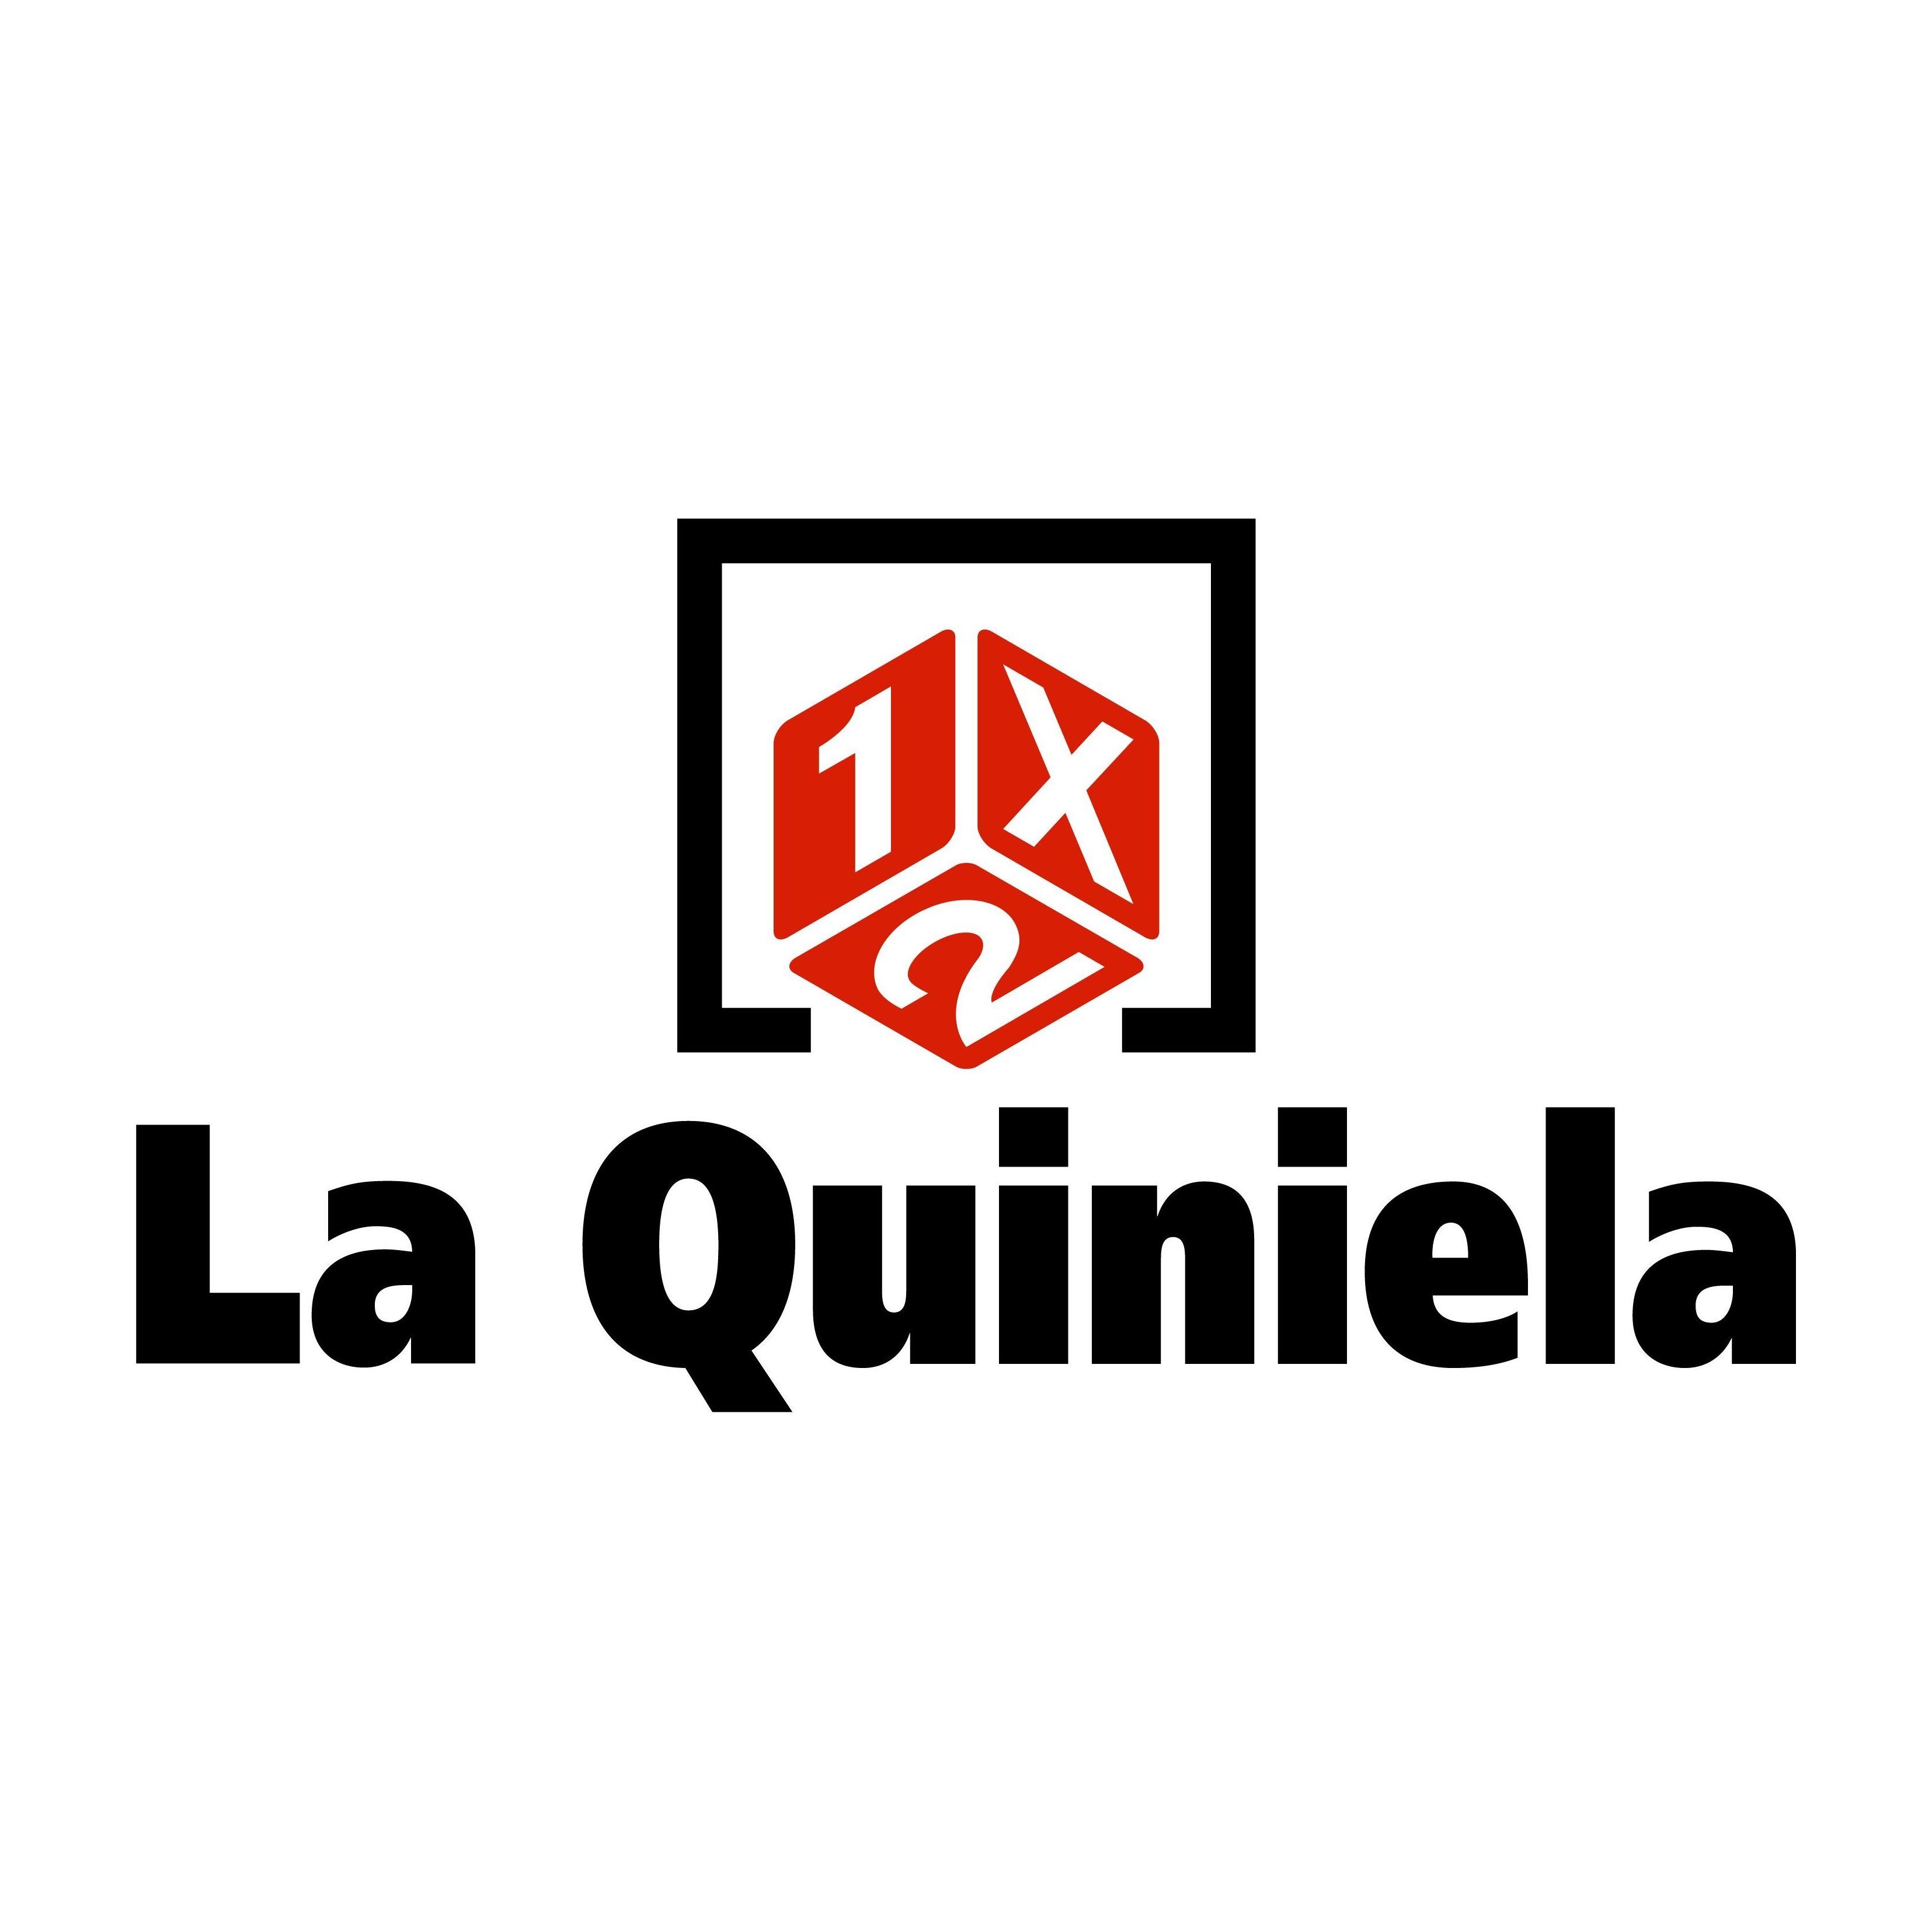 La Quiniela